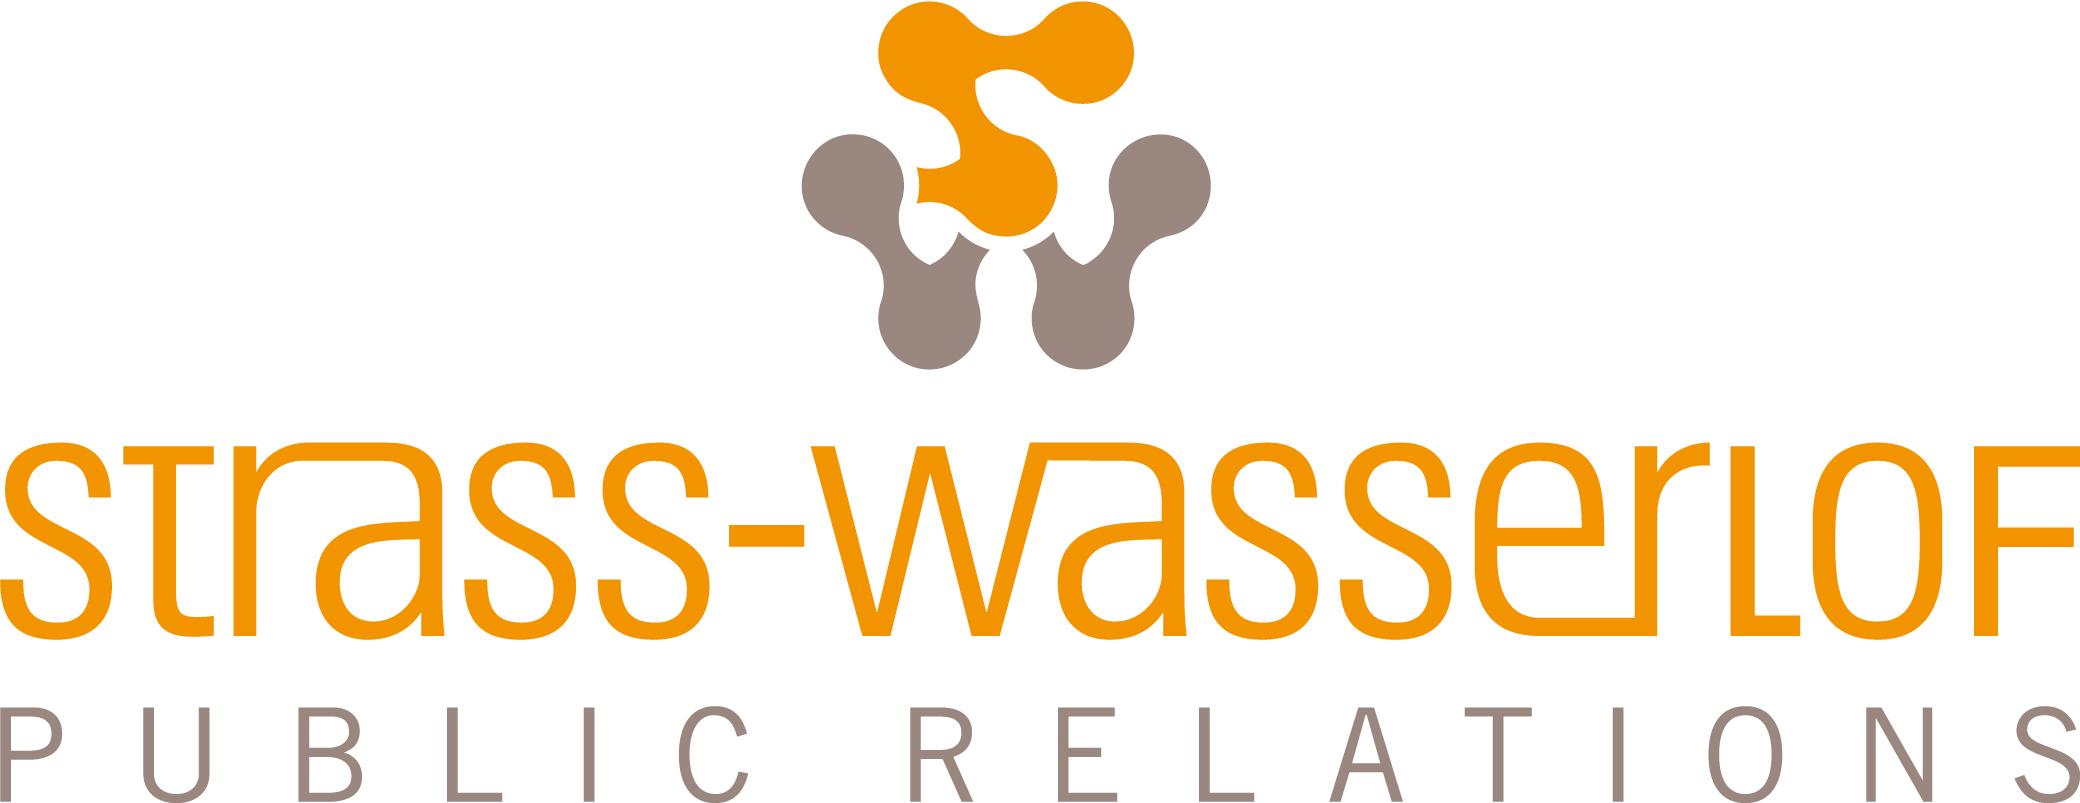 Strass-Wasserlof Public Relations